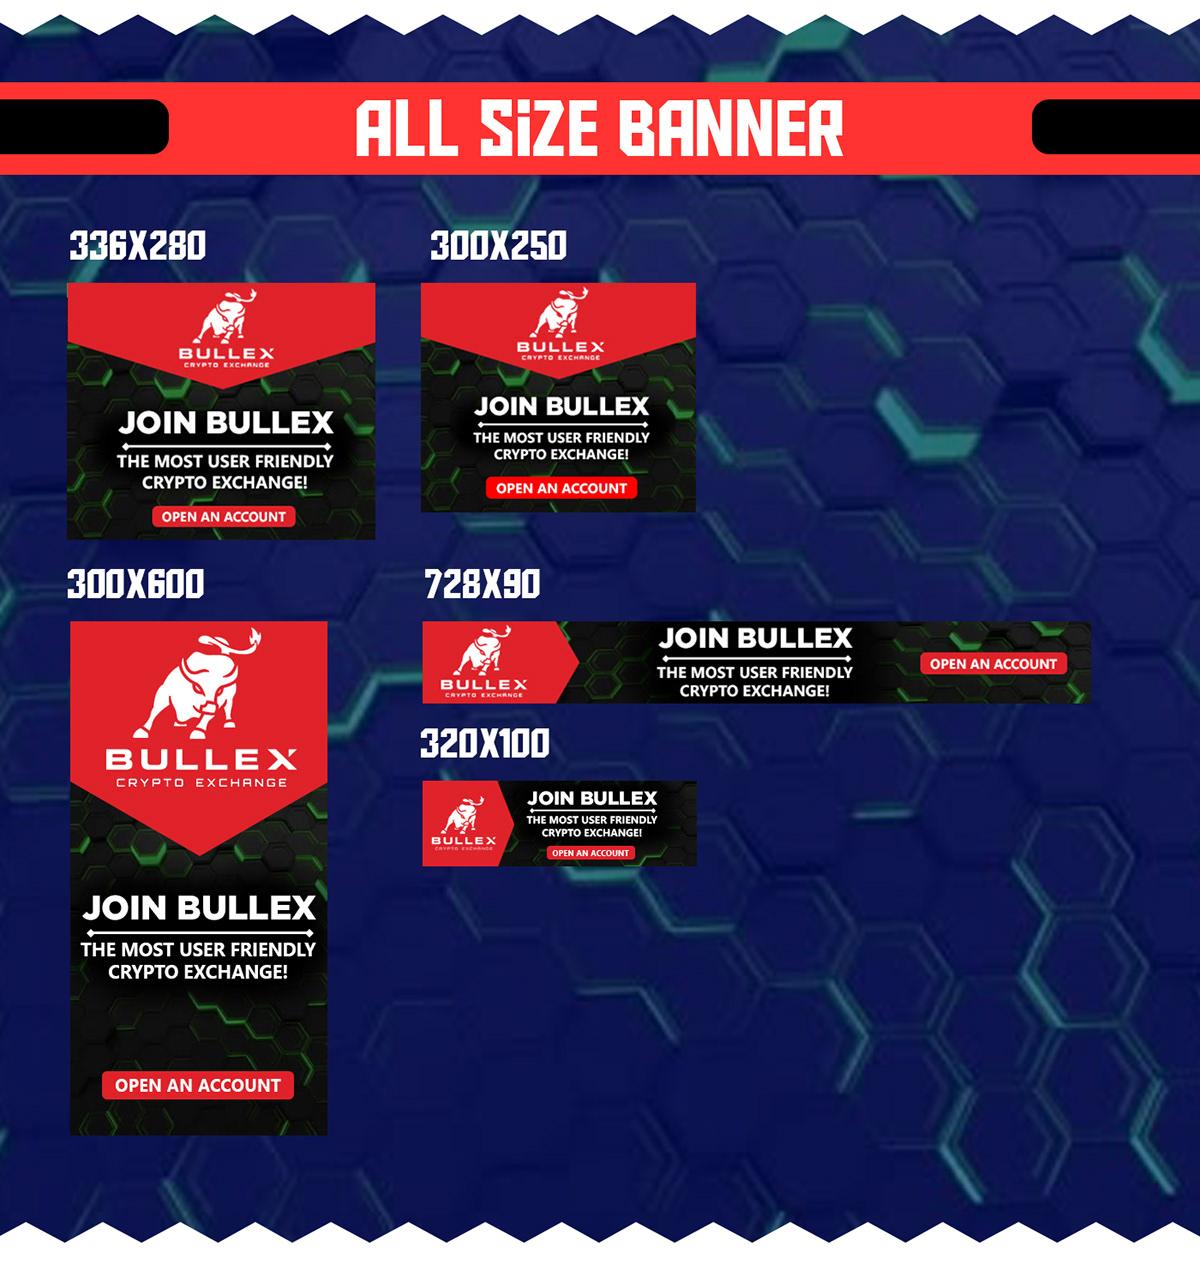 Bullex-Banner Ads Design 2 on Wacom Gallery